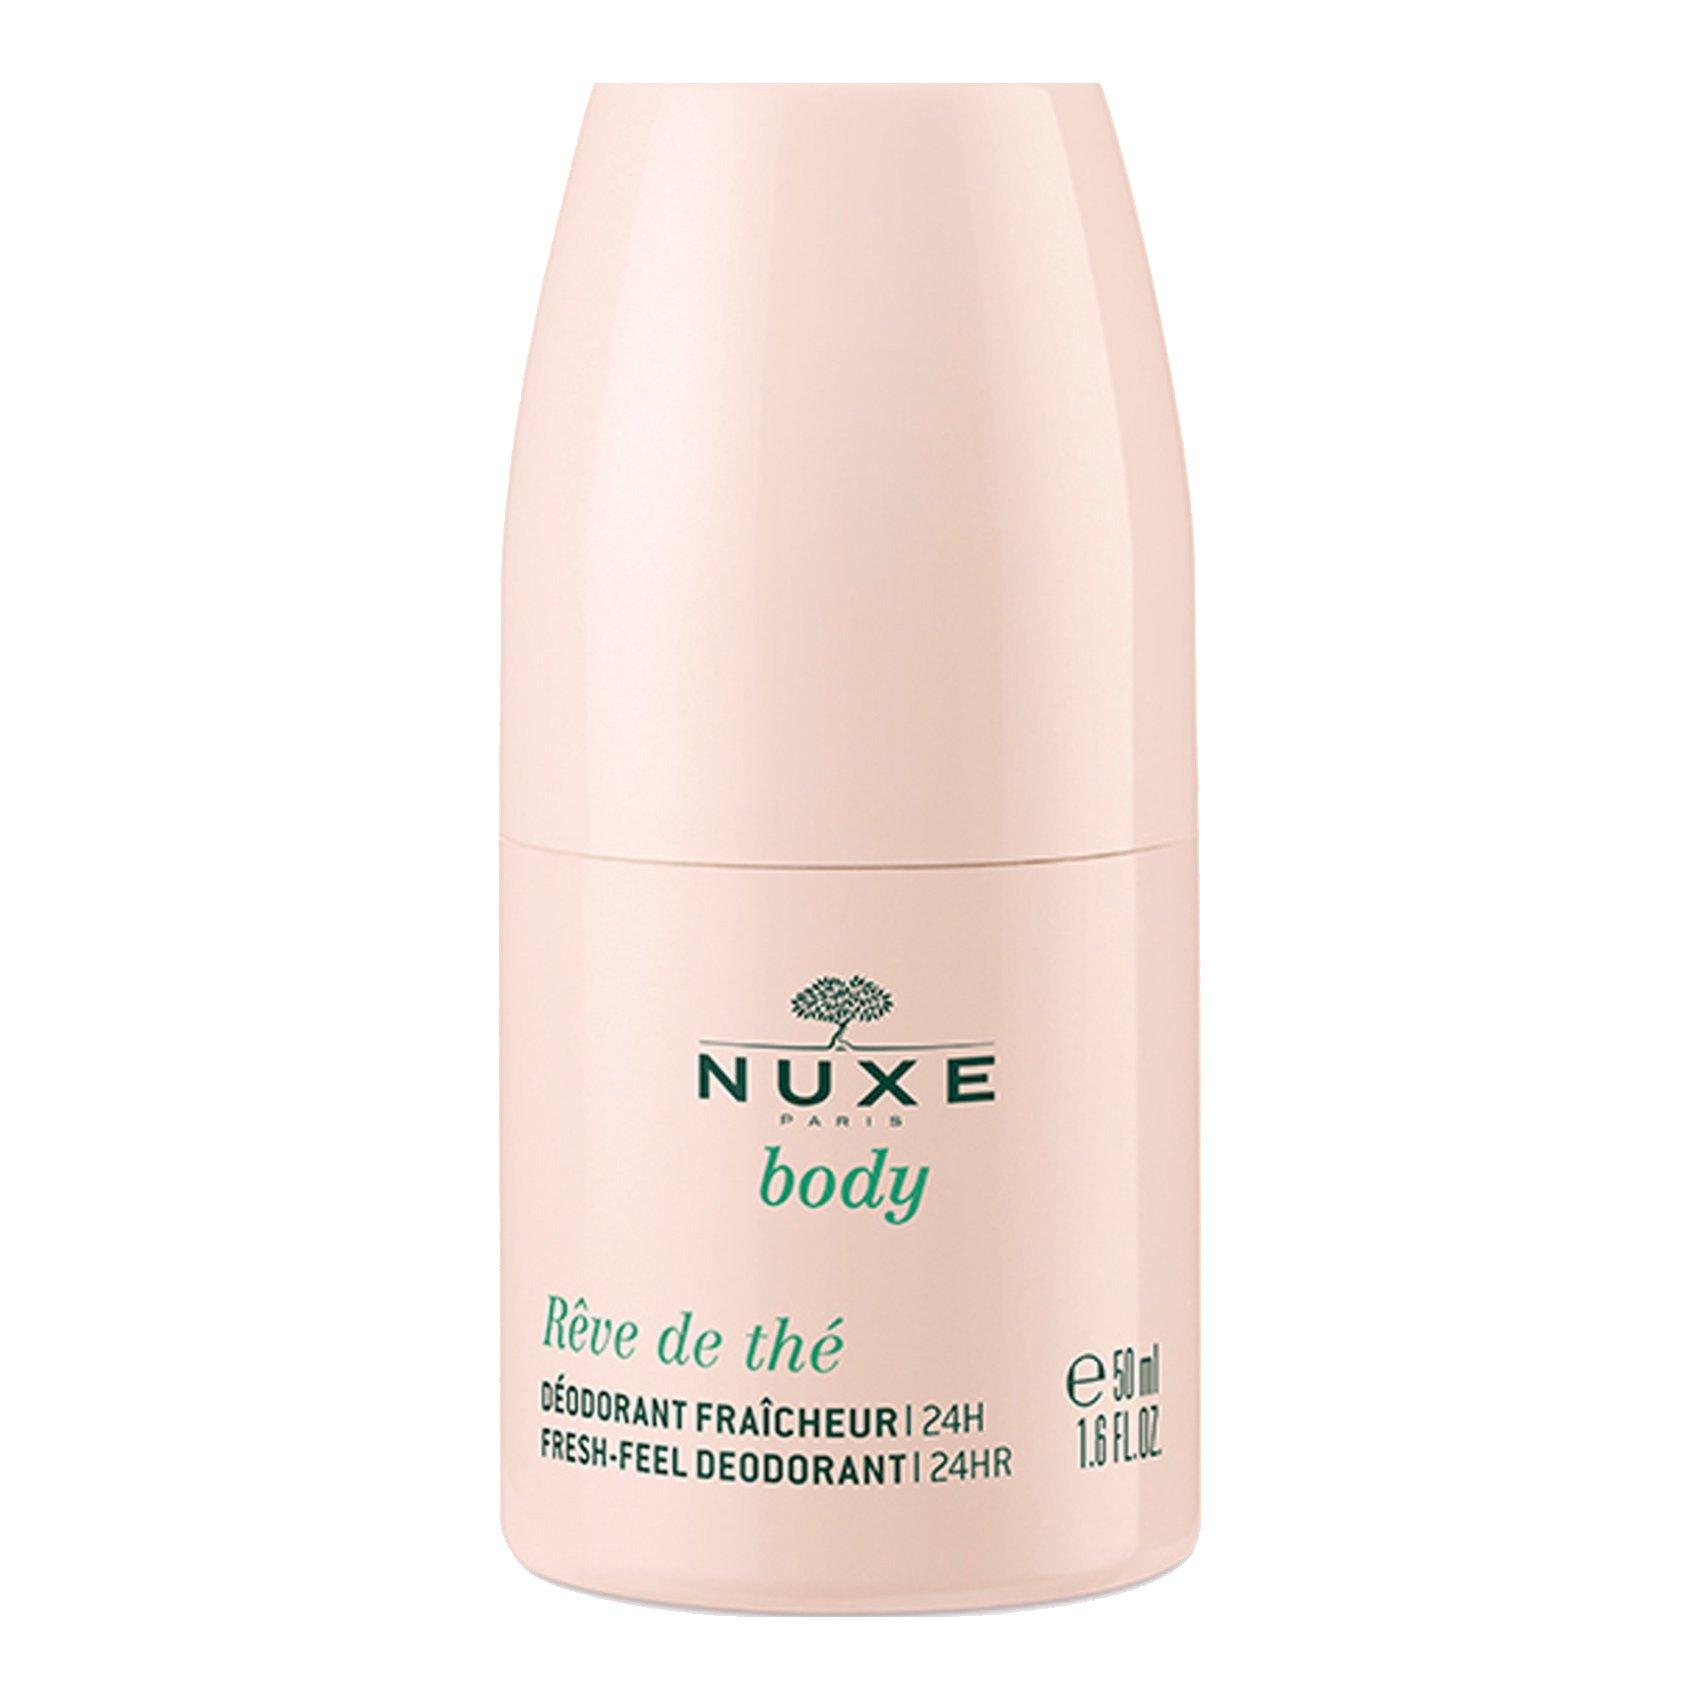 Nuxe Body Reve de The 24h Fresh Feel Deodorant Αποσμητικό σε μορφή Roll on Προστασίας για Αίσθηση Φρεσκάδας 50ml